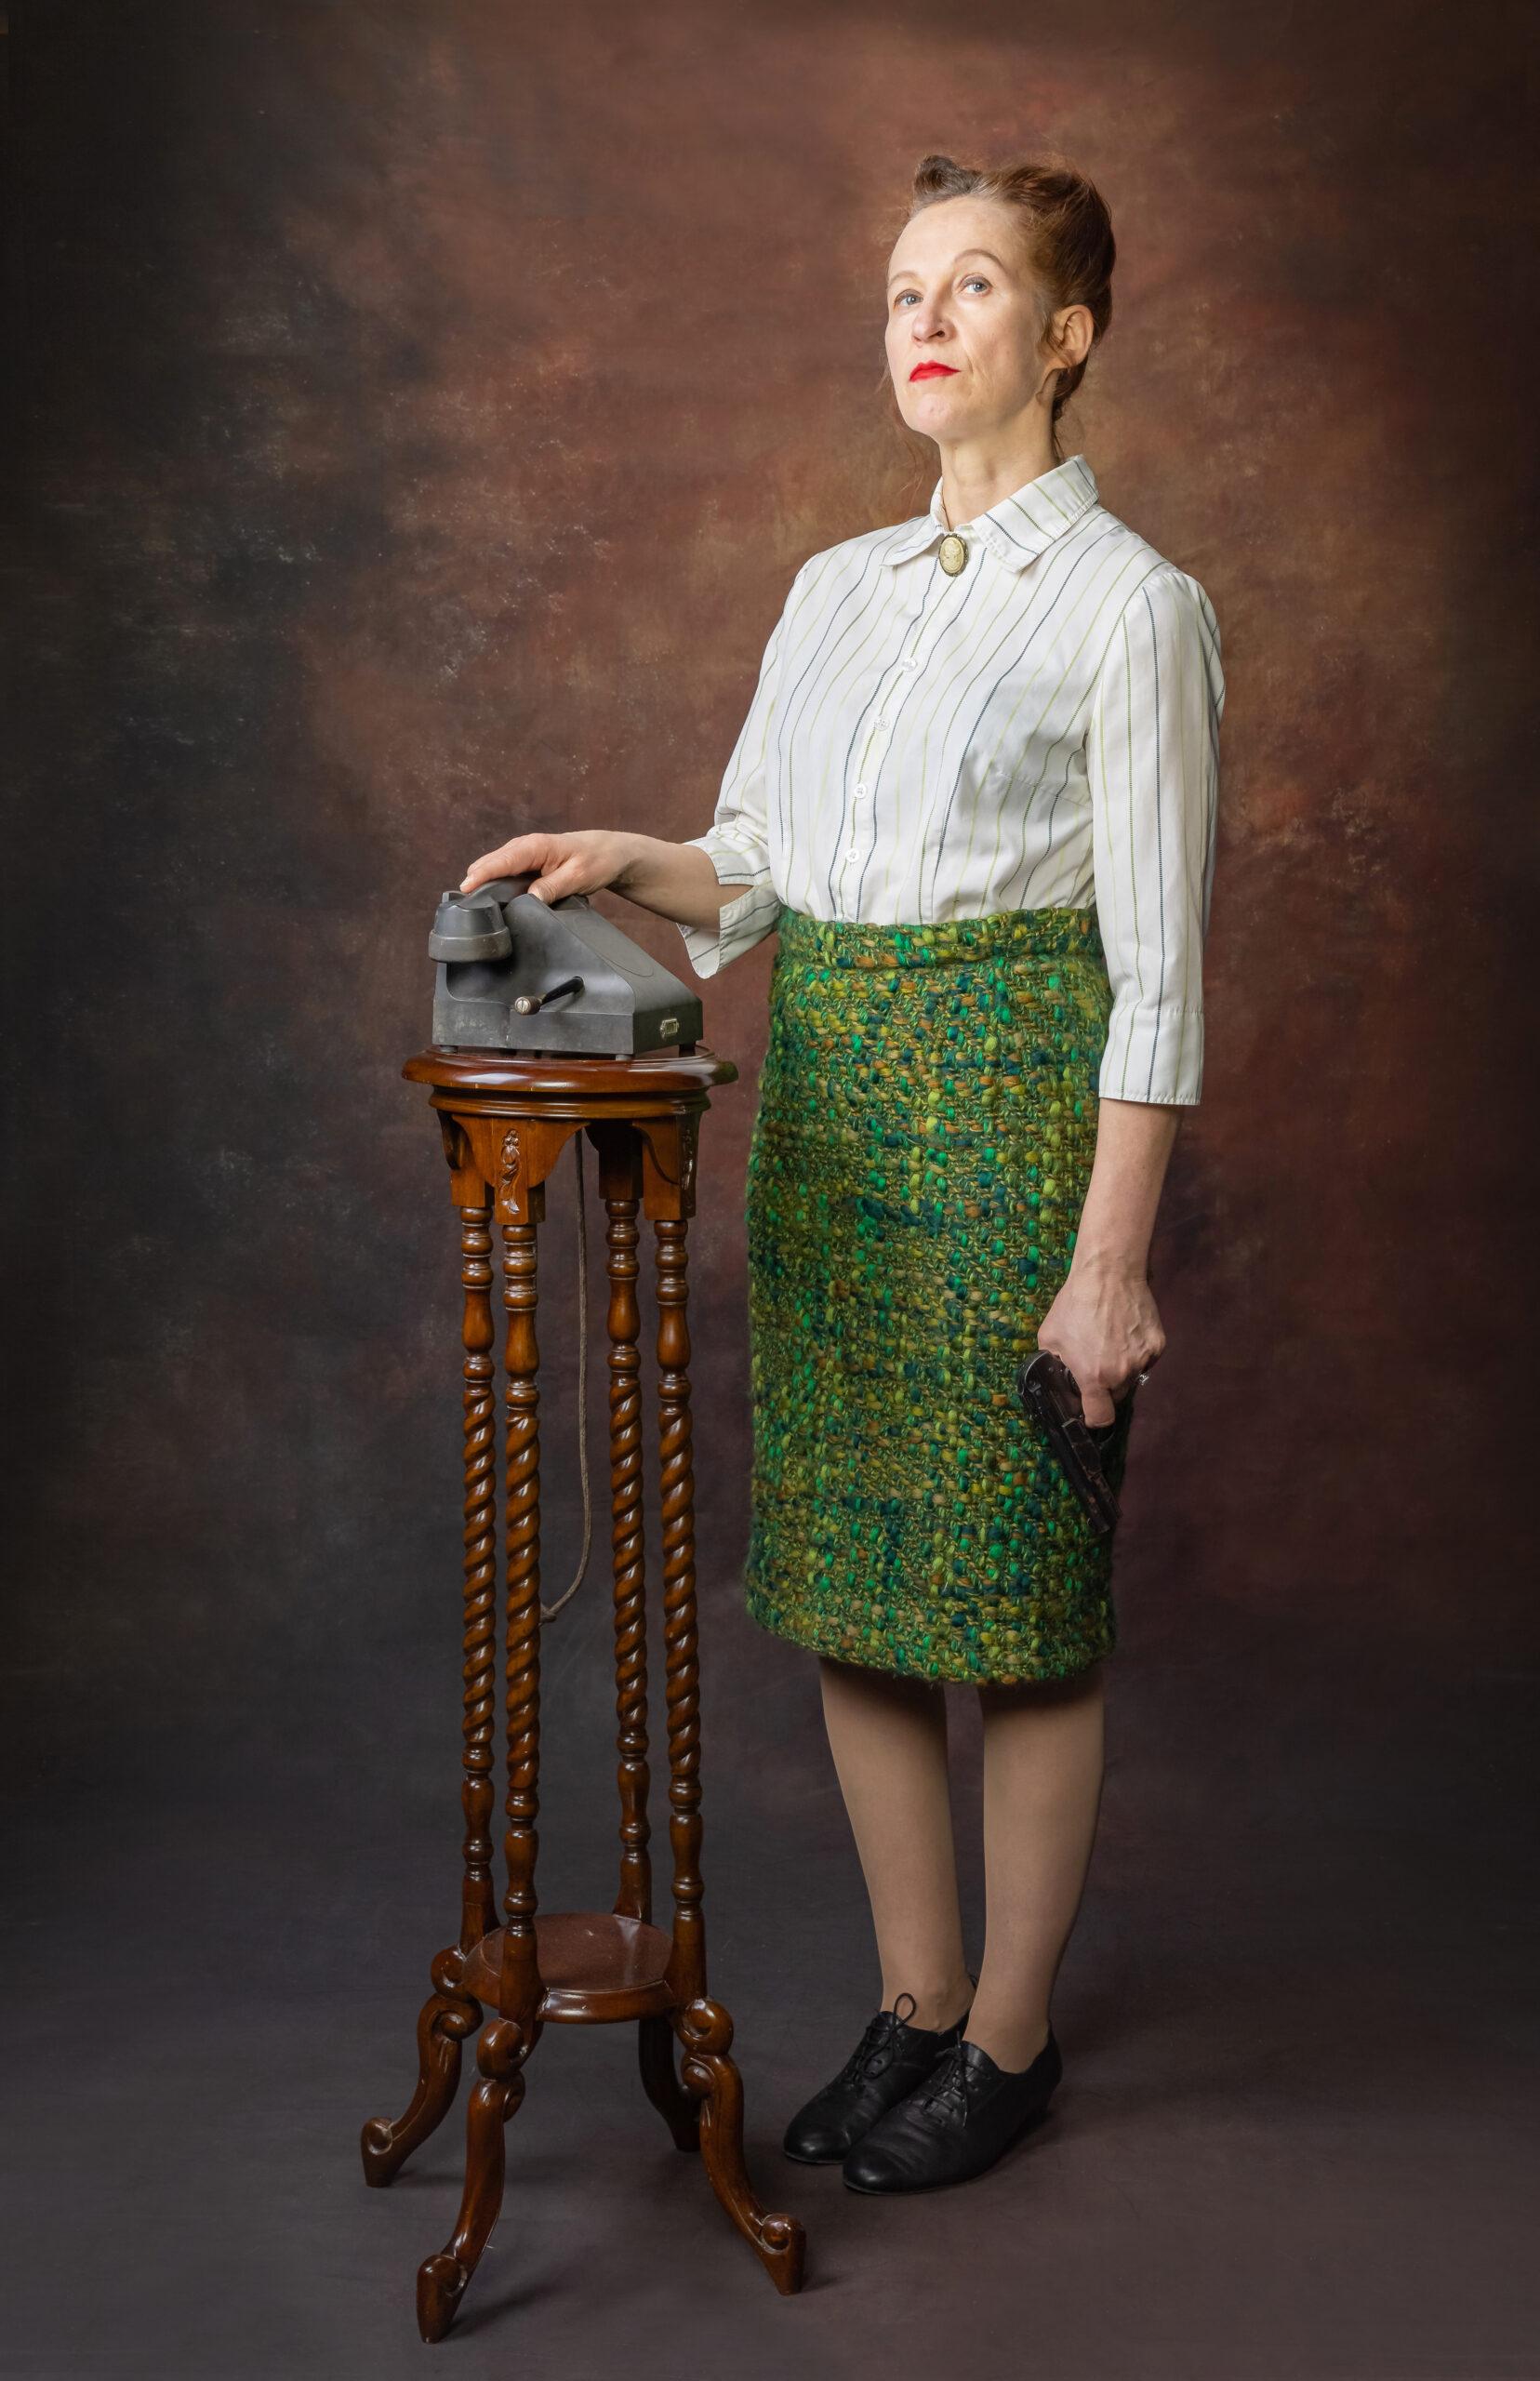 hiirenloukku, Agatha Christie, murhamysteeri, kiuruvesi, teatteri